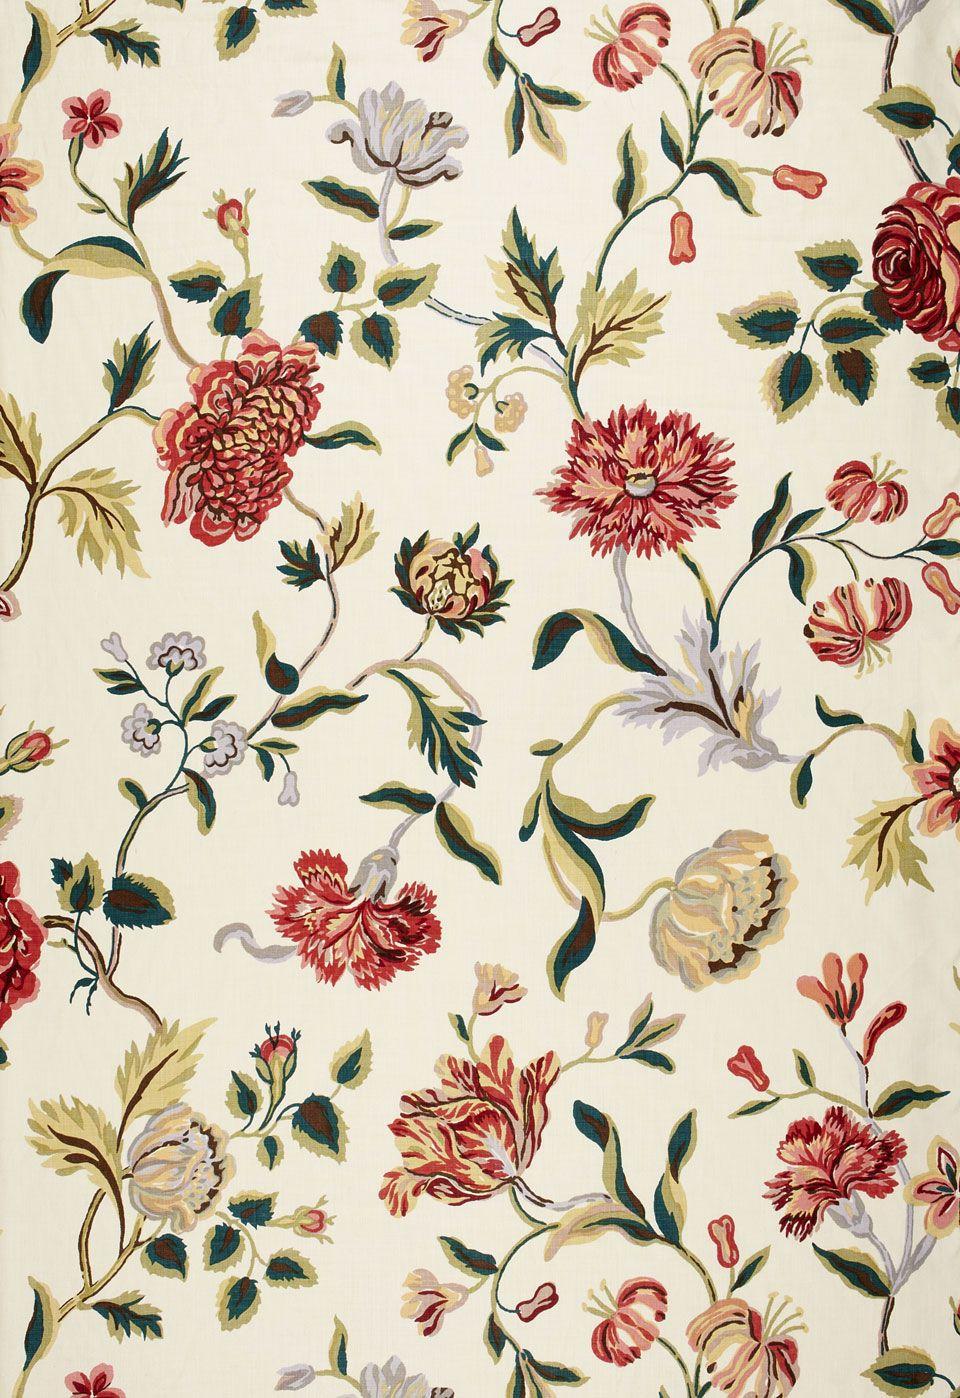 Fabric | Avebury Floral Vine in Document Rose | Schumacher